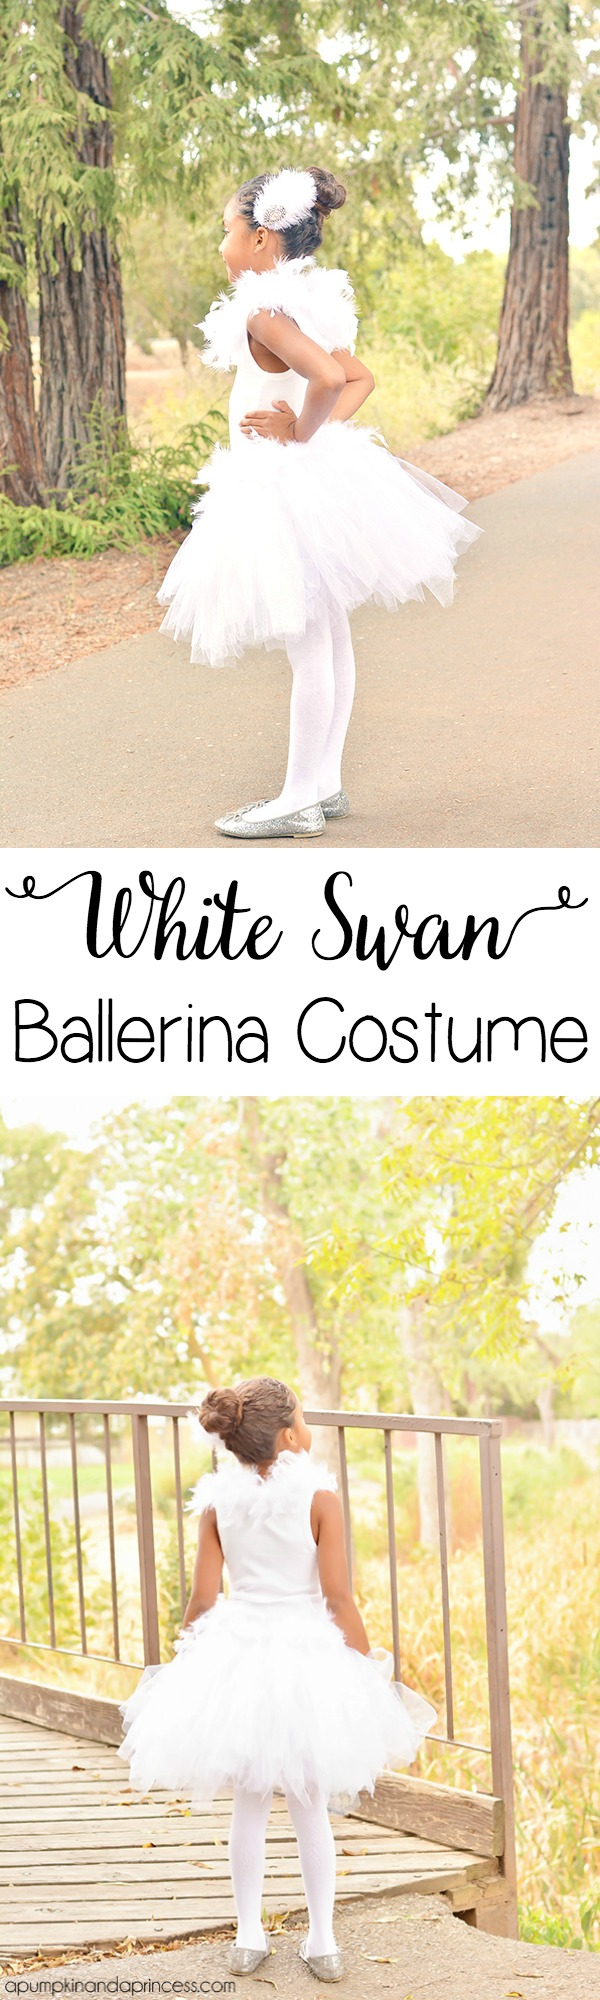 DIY White Swan Ballerina Costume